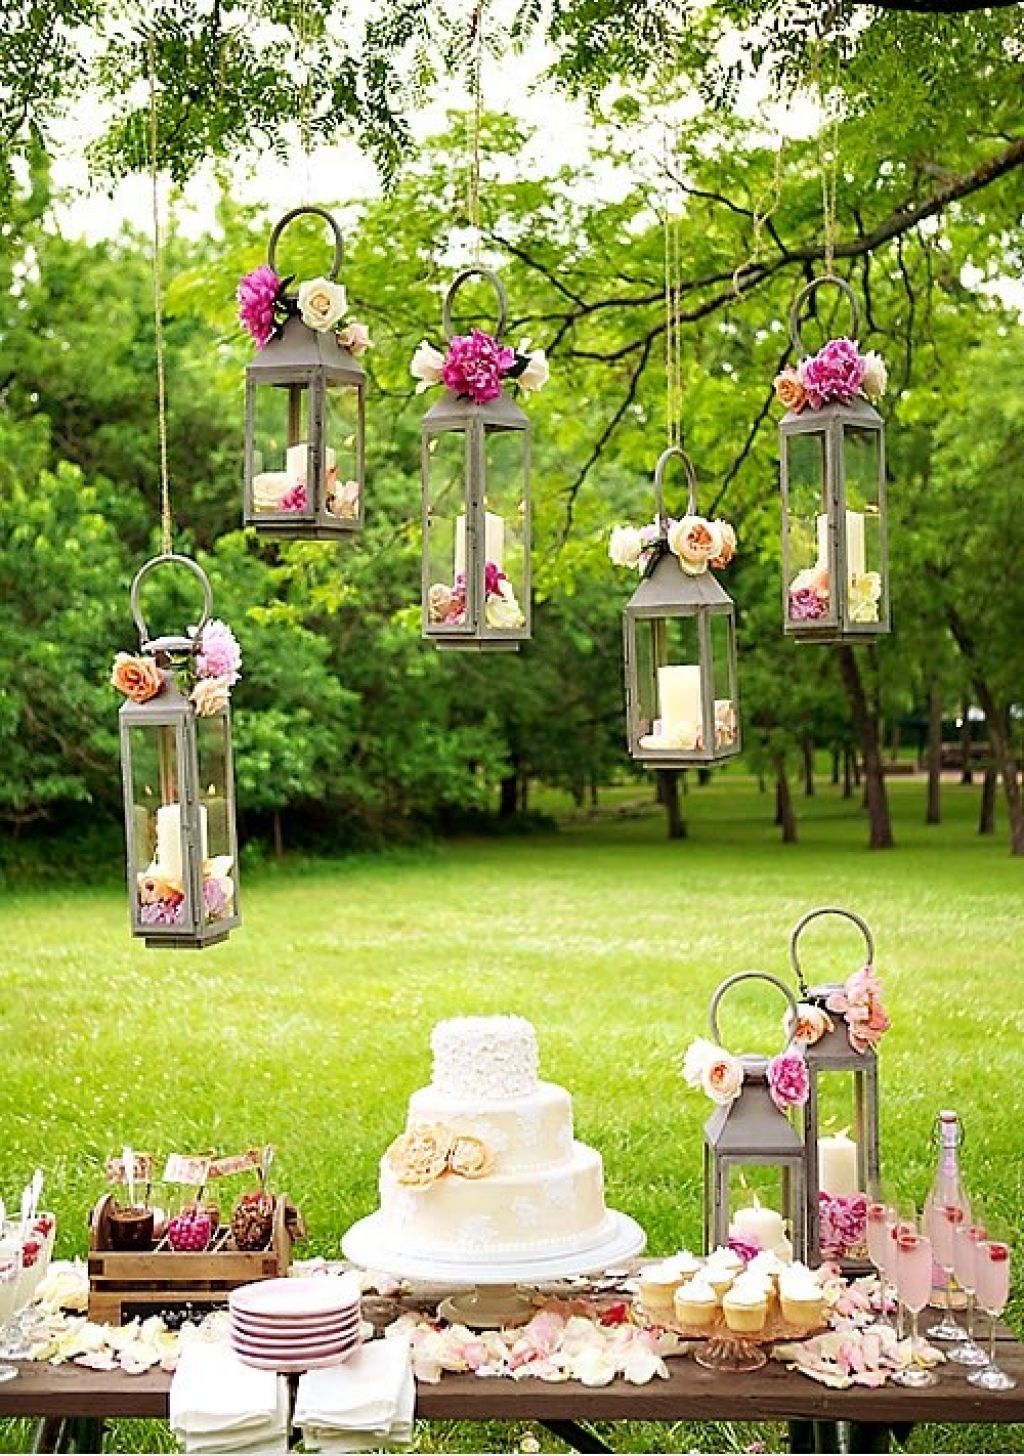 garden party ideas  Google Search  bridal shower